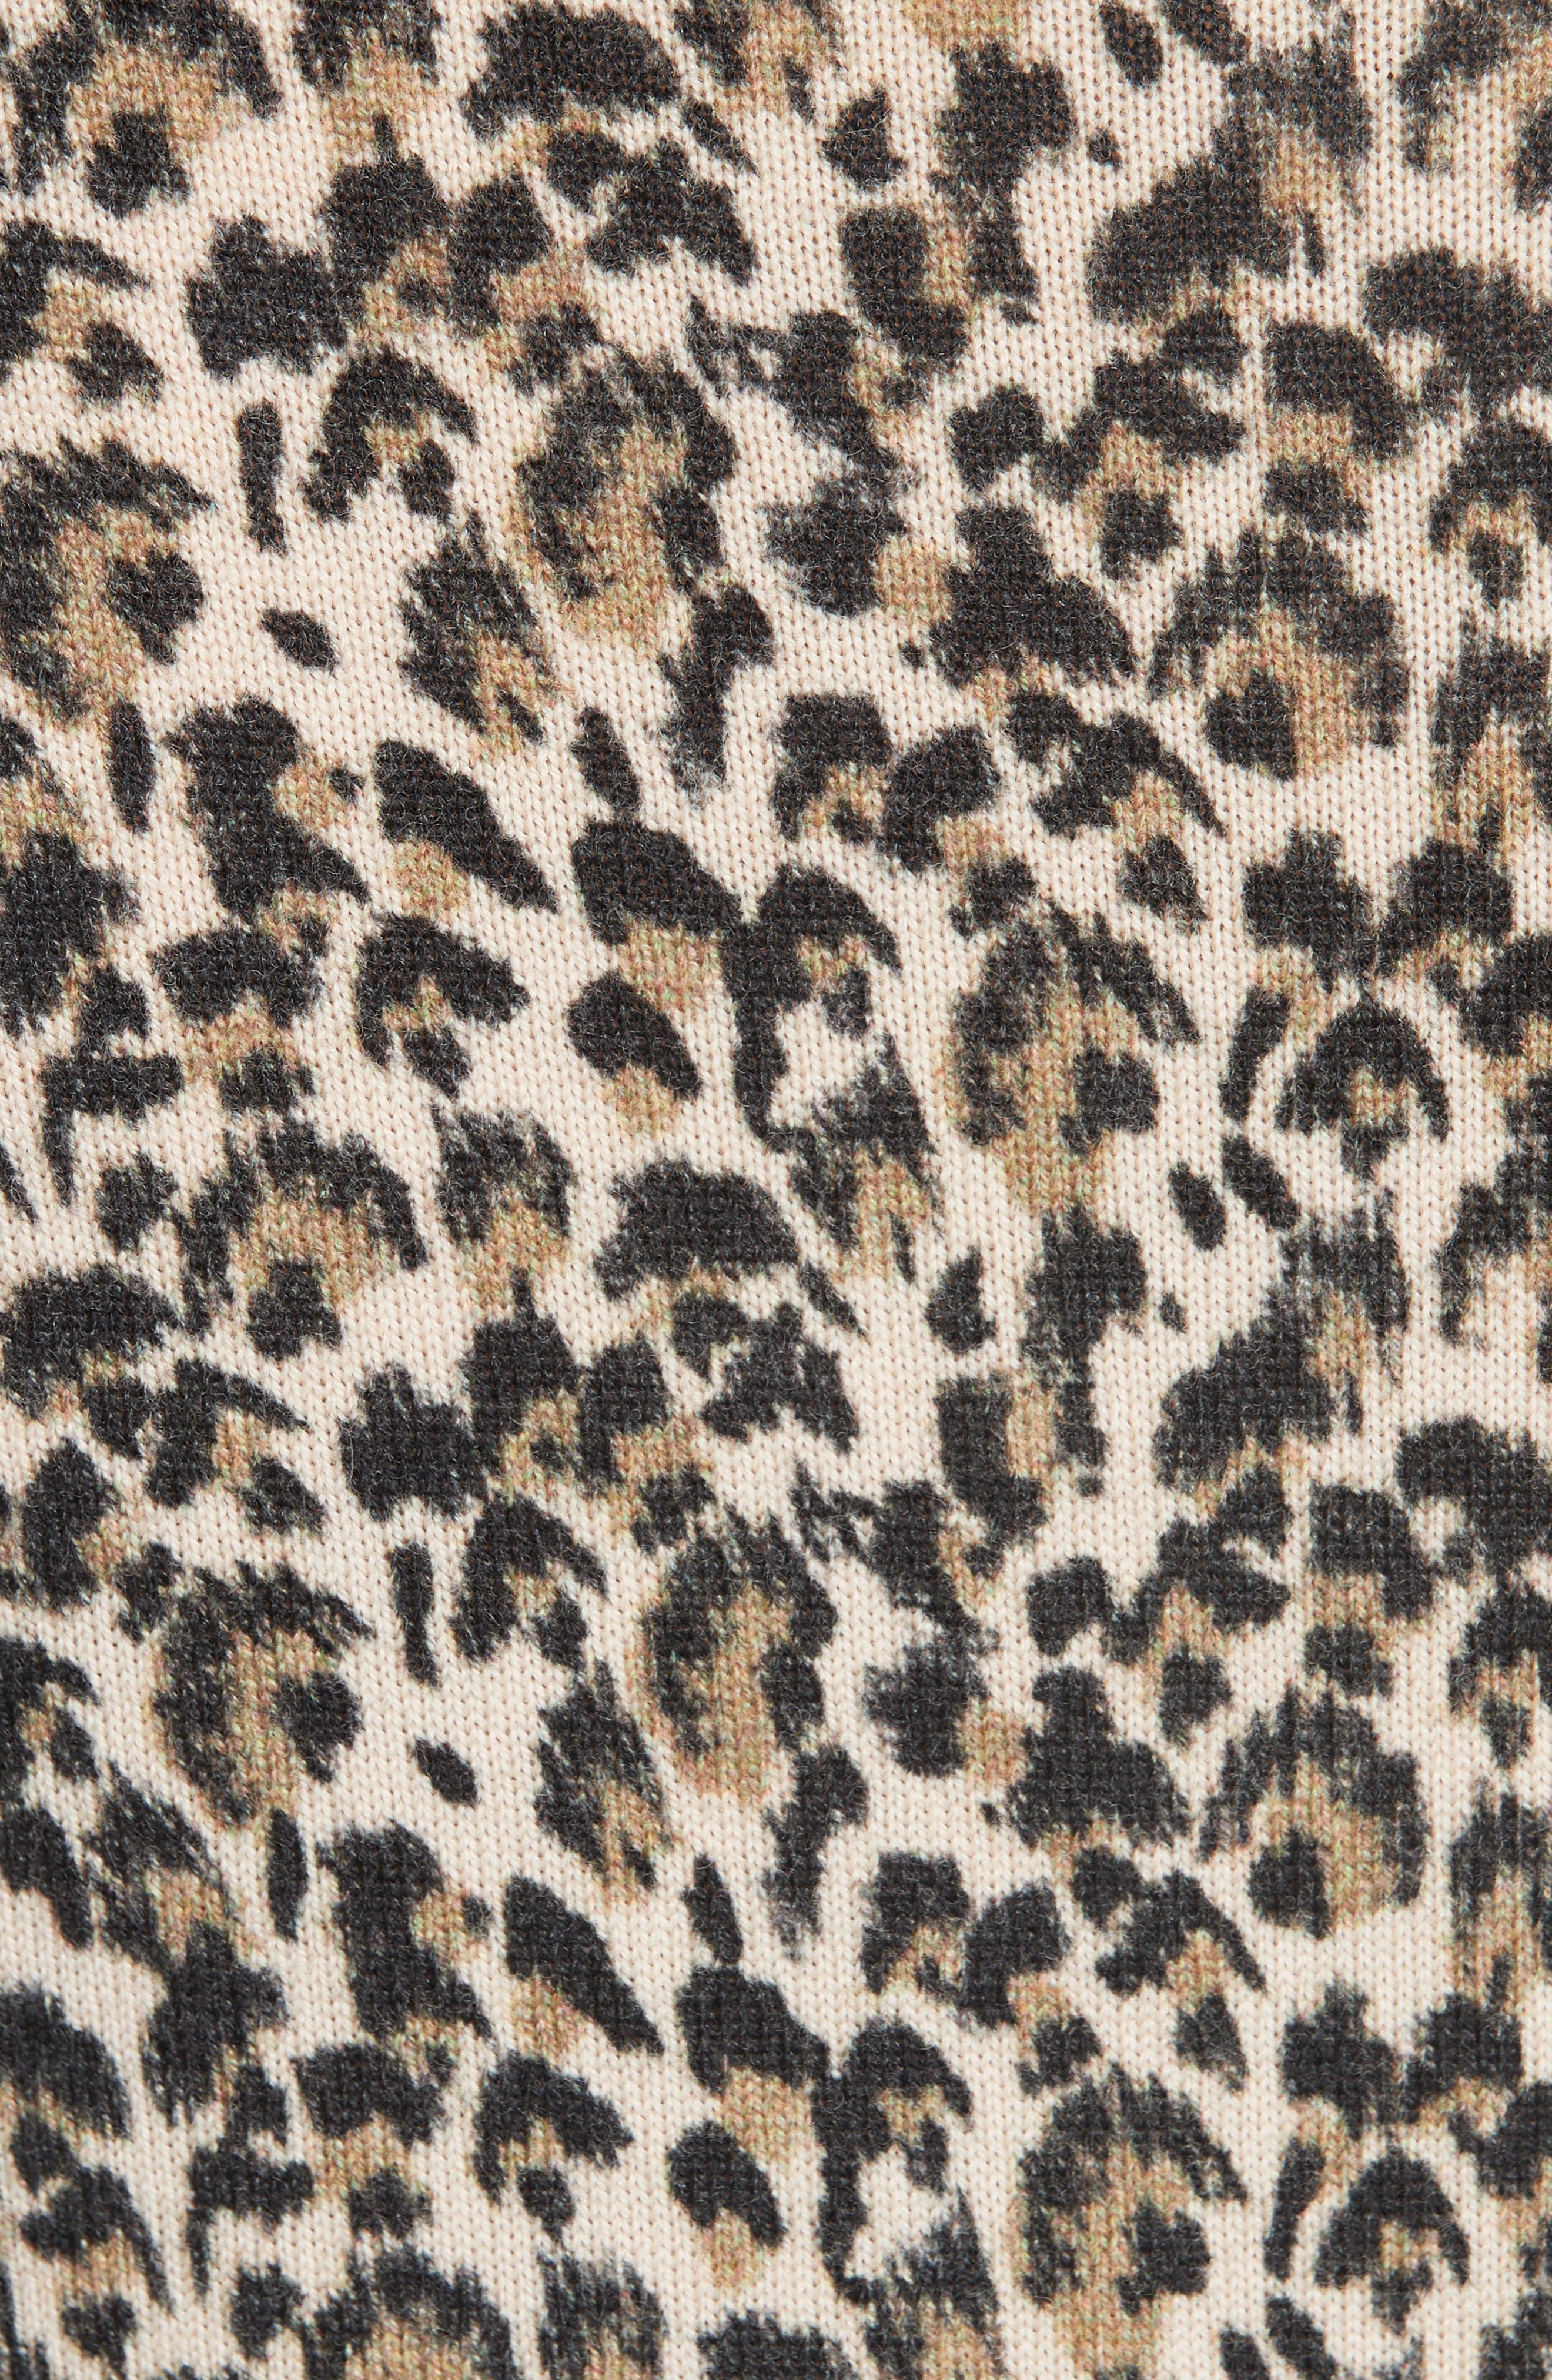 Leopard Print Wool Sweater,                             Alternate thumbnail 5, color,                             250